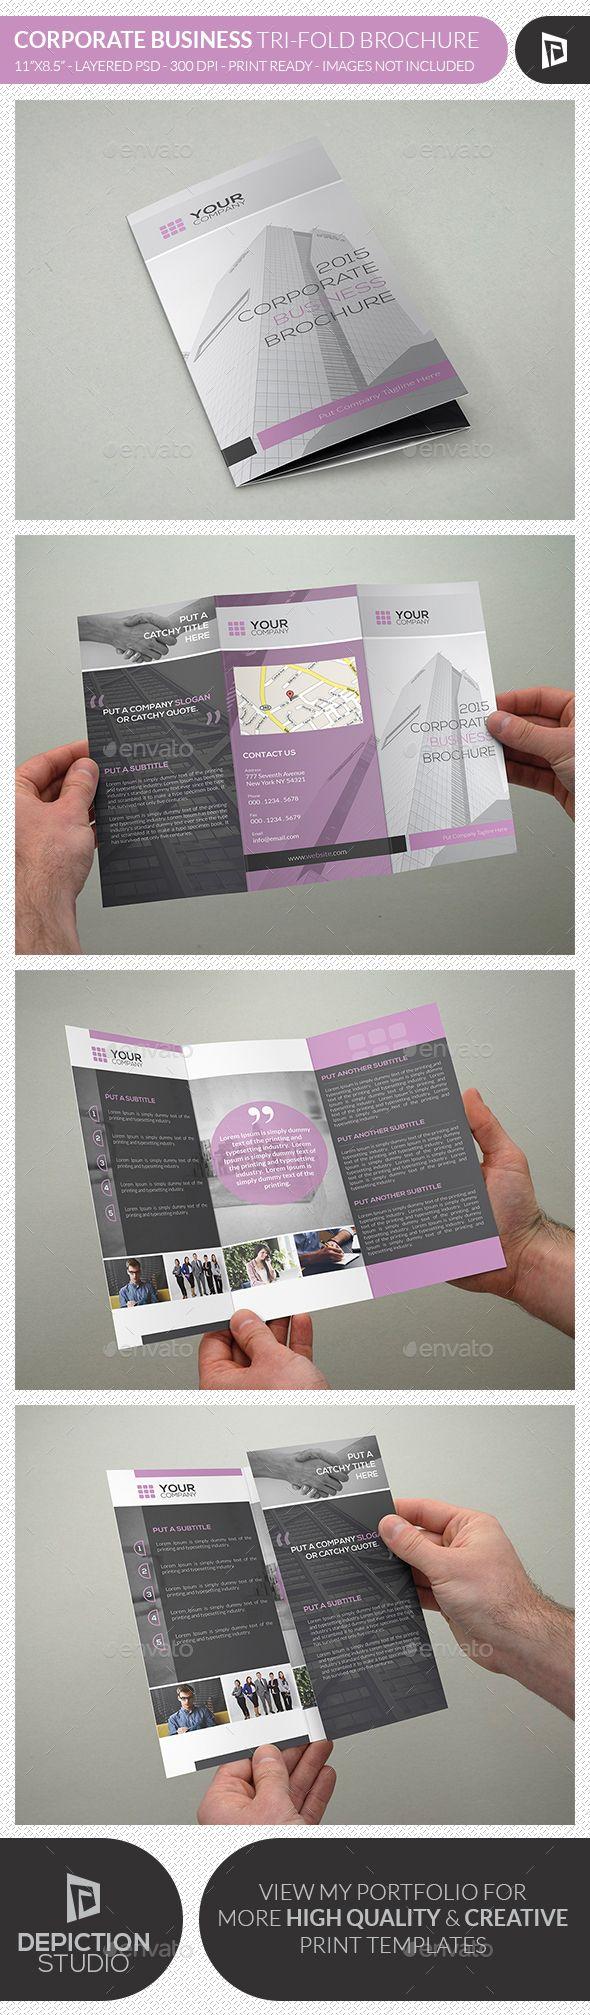 Corporate Business Tri-fold Brochure Template PSD #design Download: http://graphicriver.net/item/corporate-business-trifold-brochure/13426718?ref=ksioks